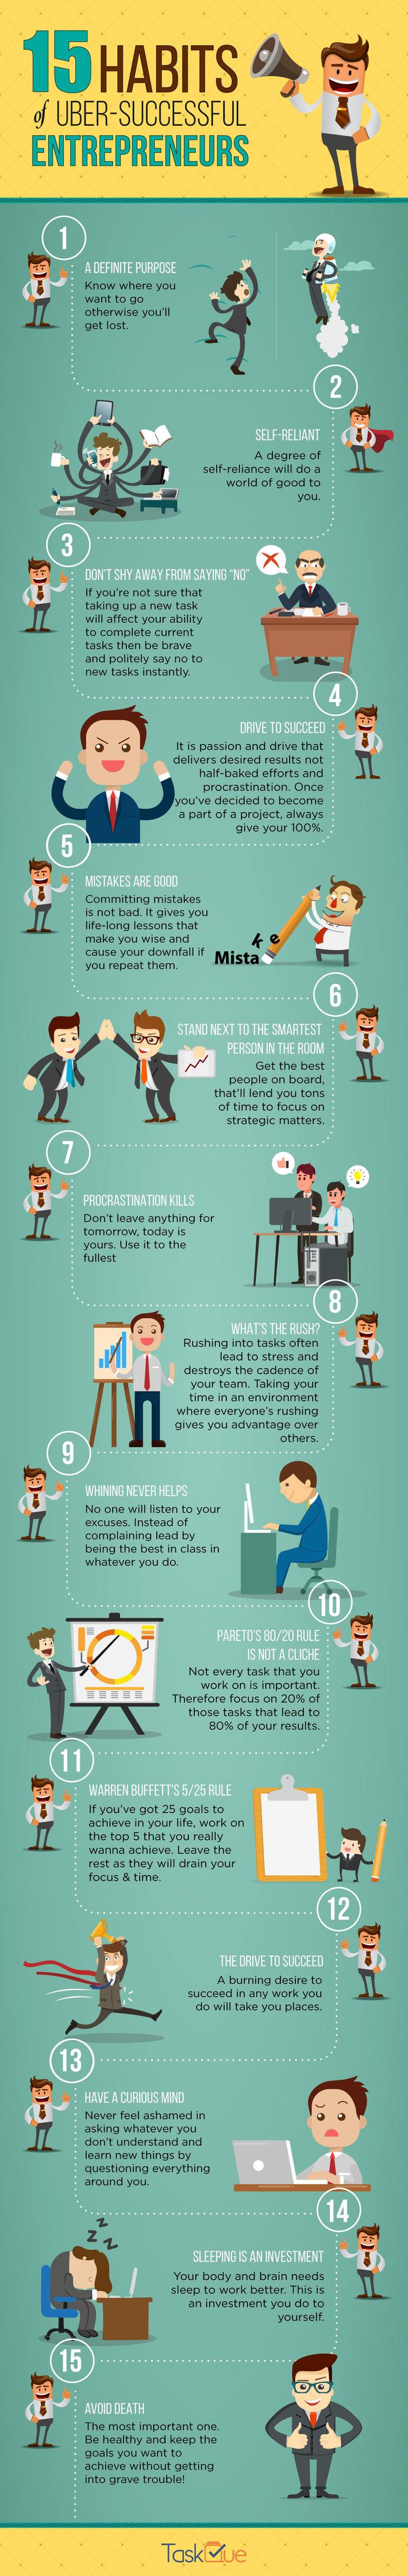 15-Habits-of-Uber-Successful-Entrepreneurs